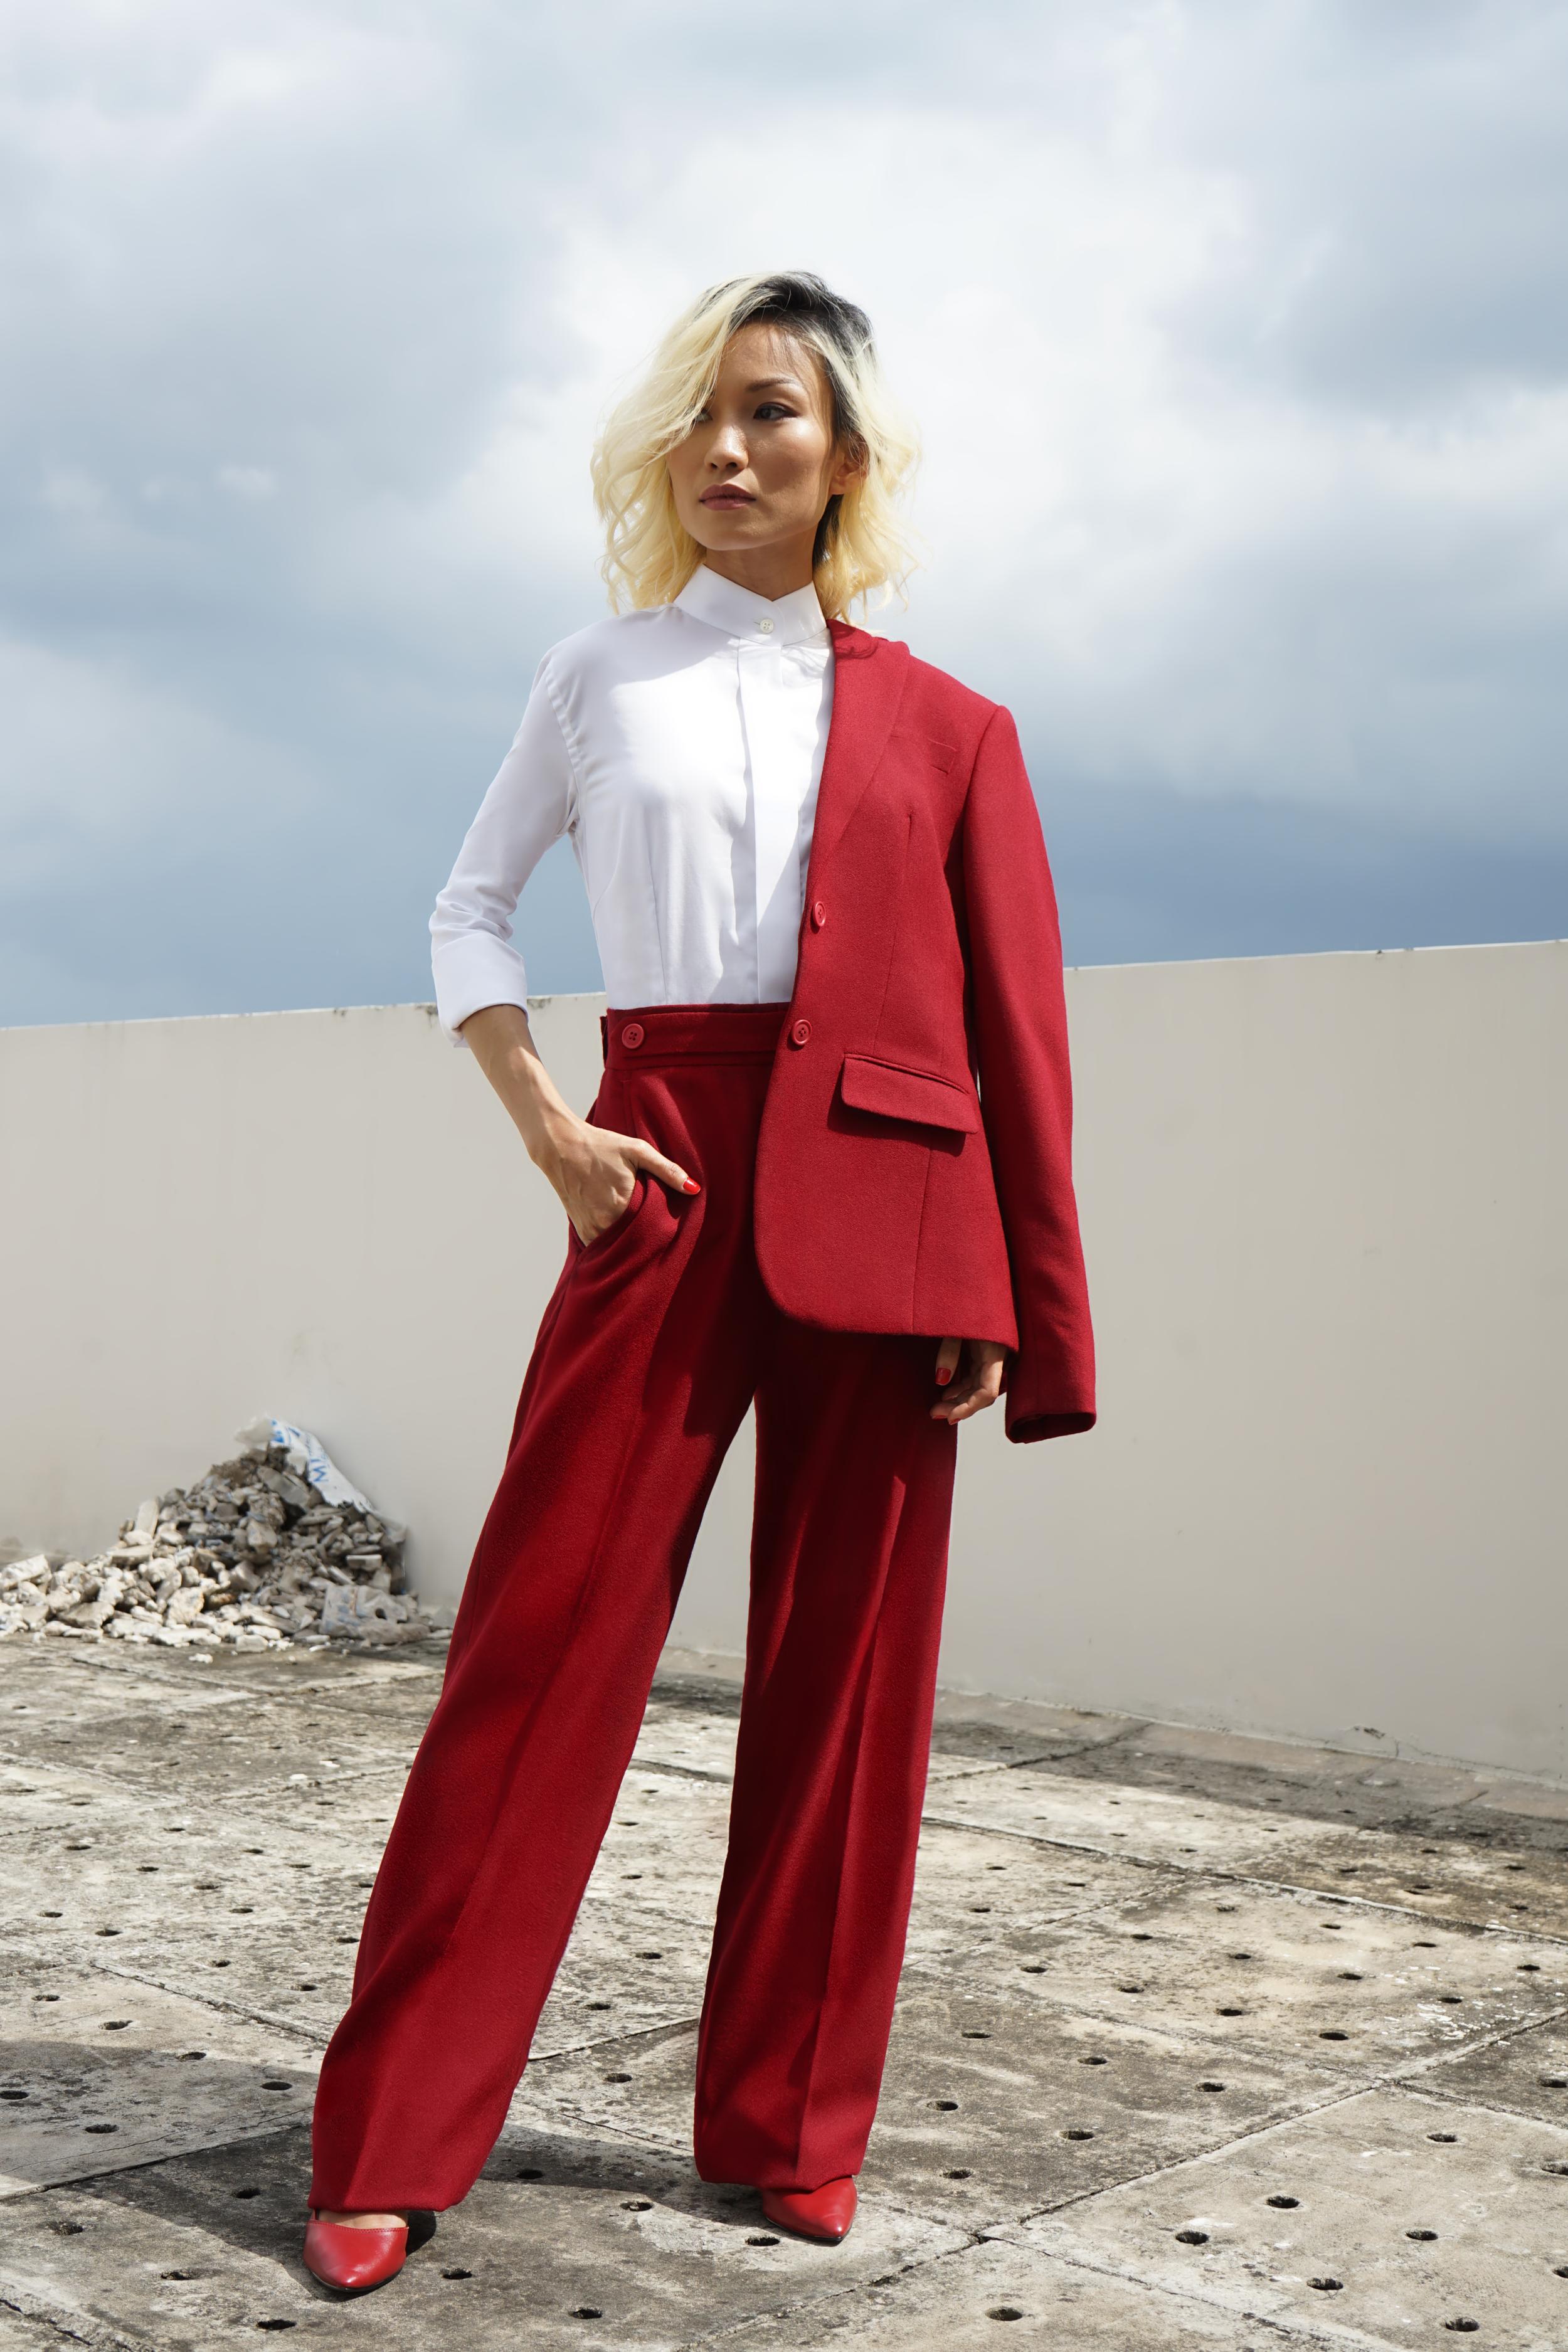 women's wide leg red pant suit